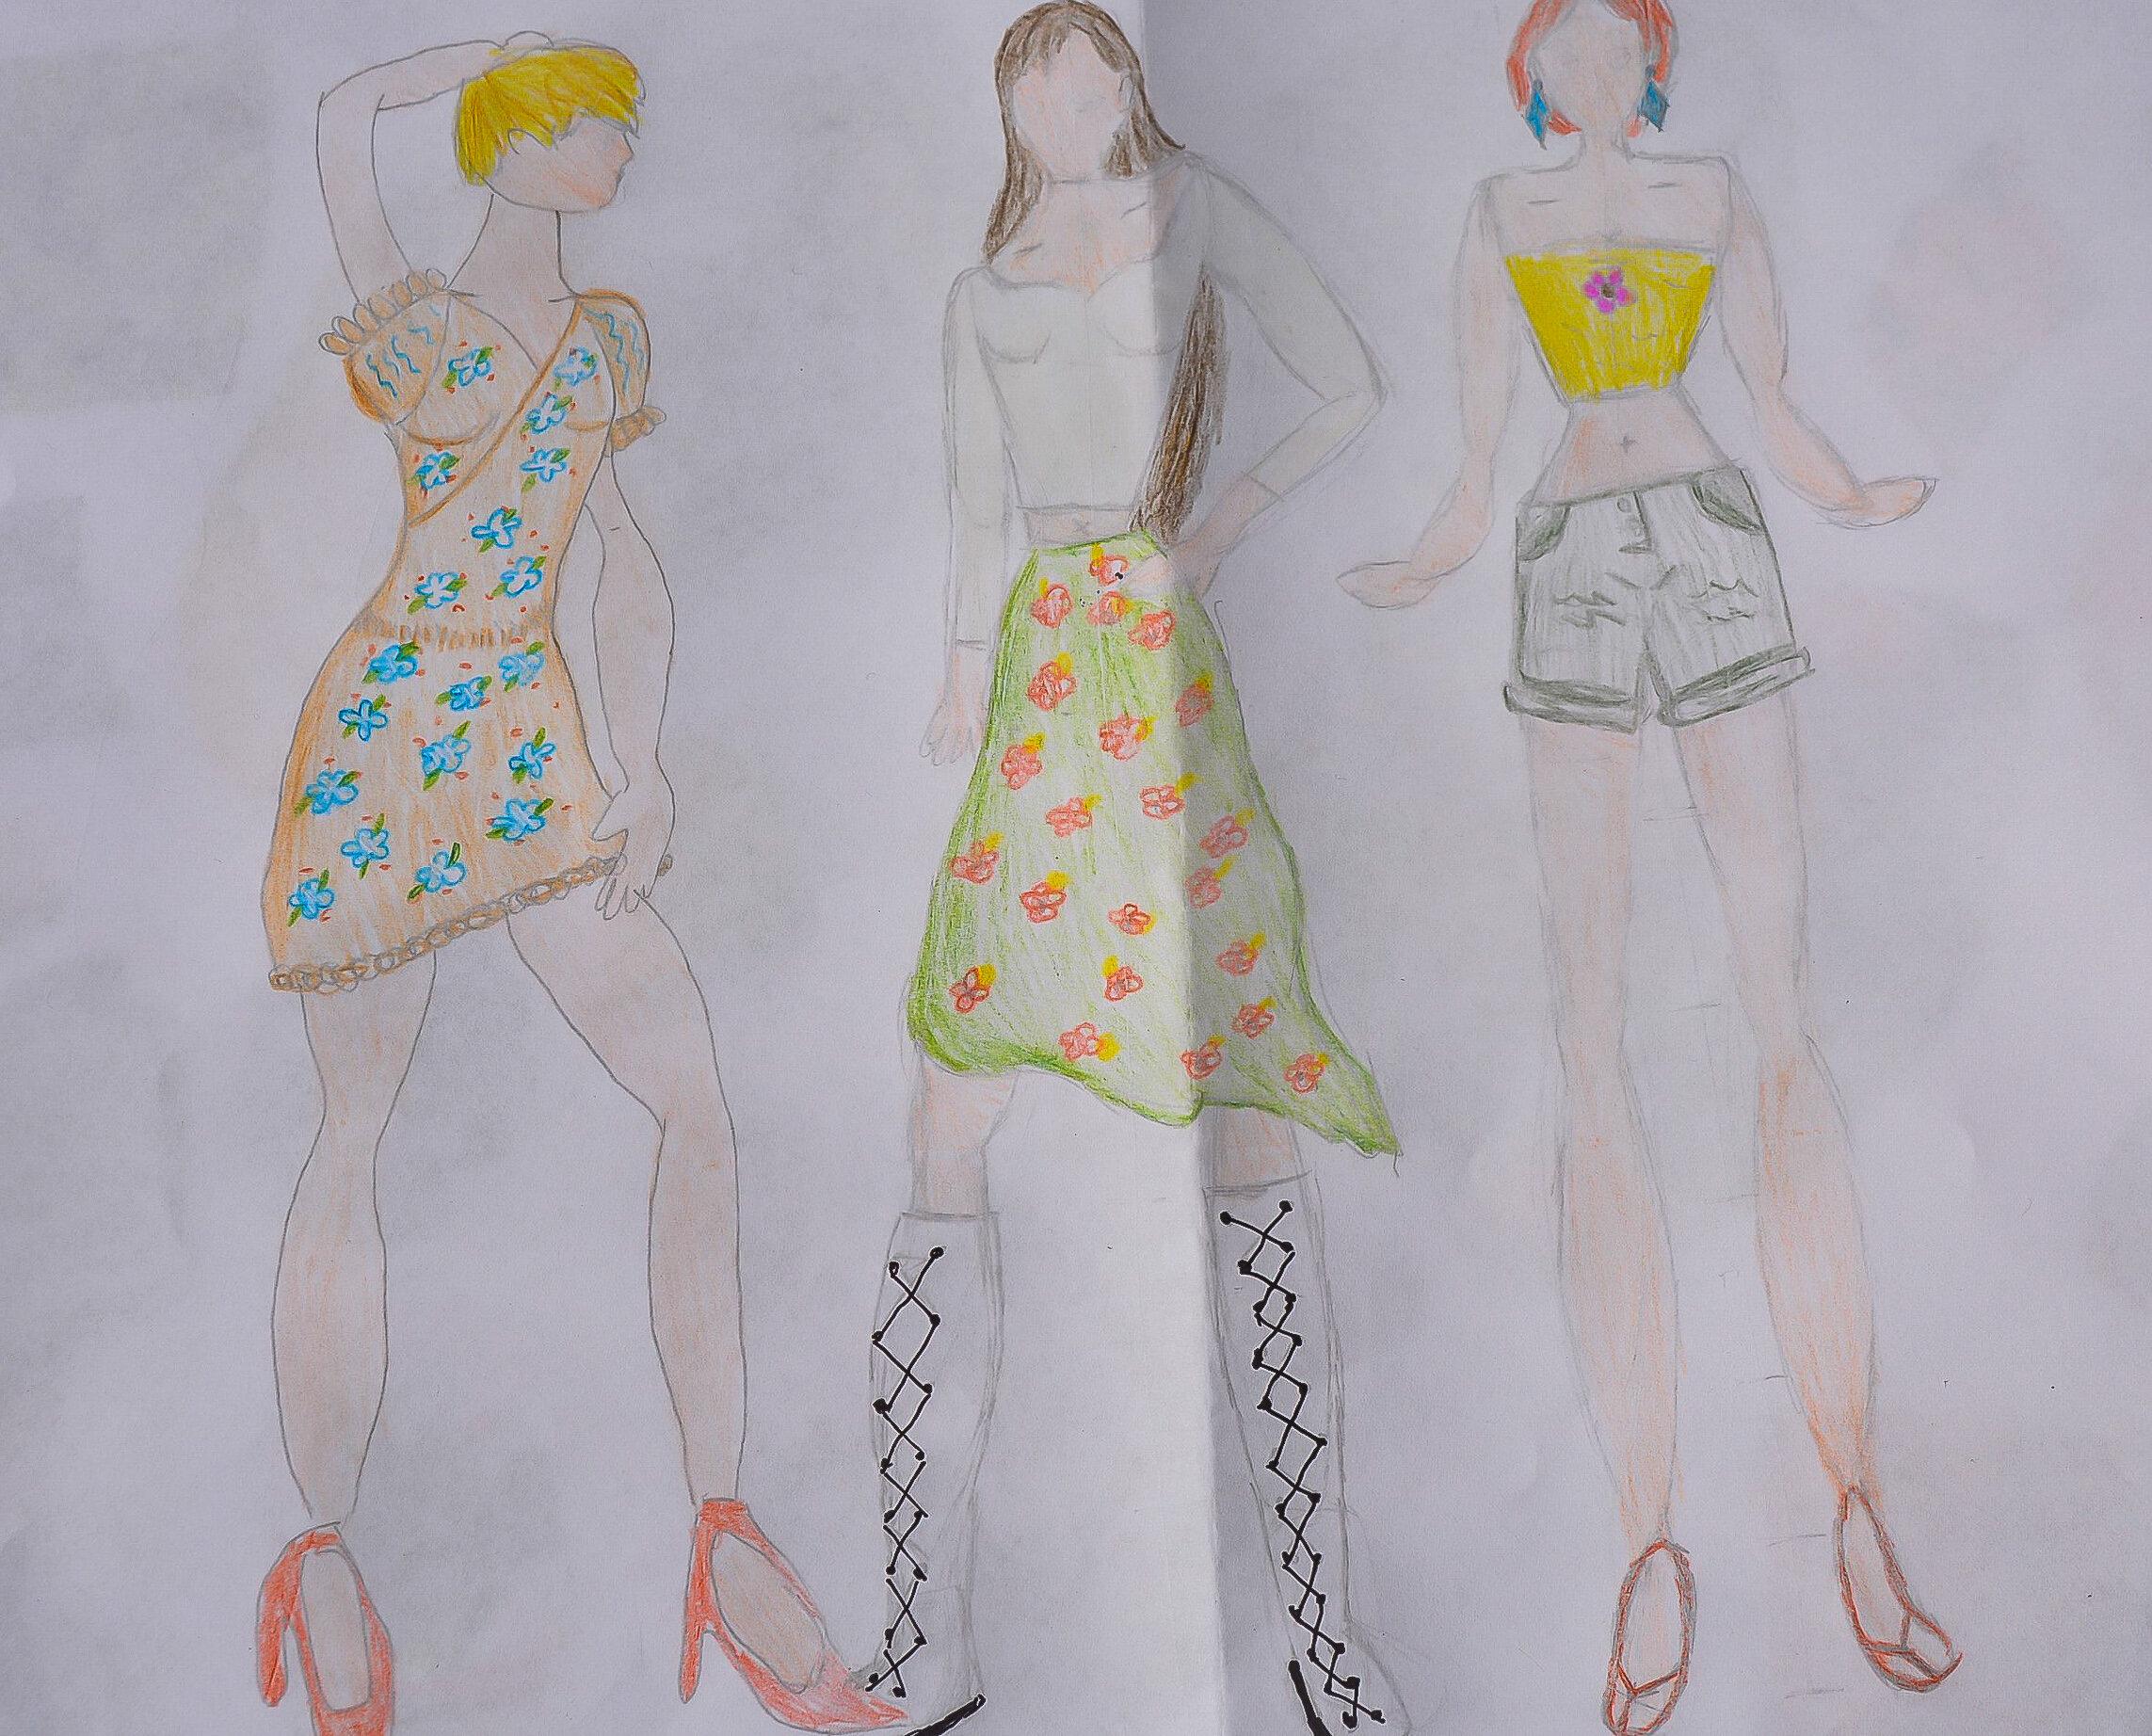 Designx Fashion Illustration Prototyping For Kids